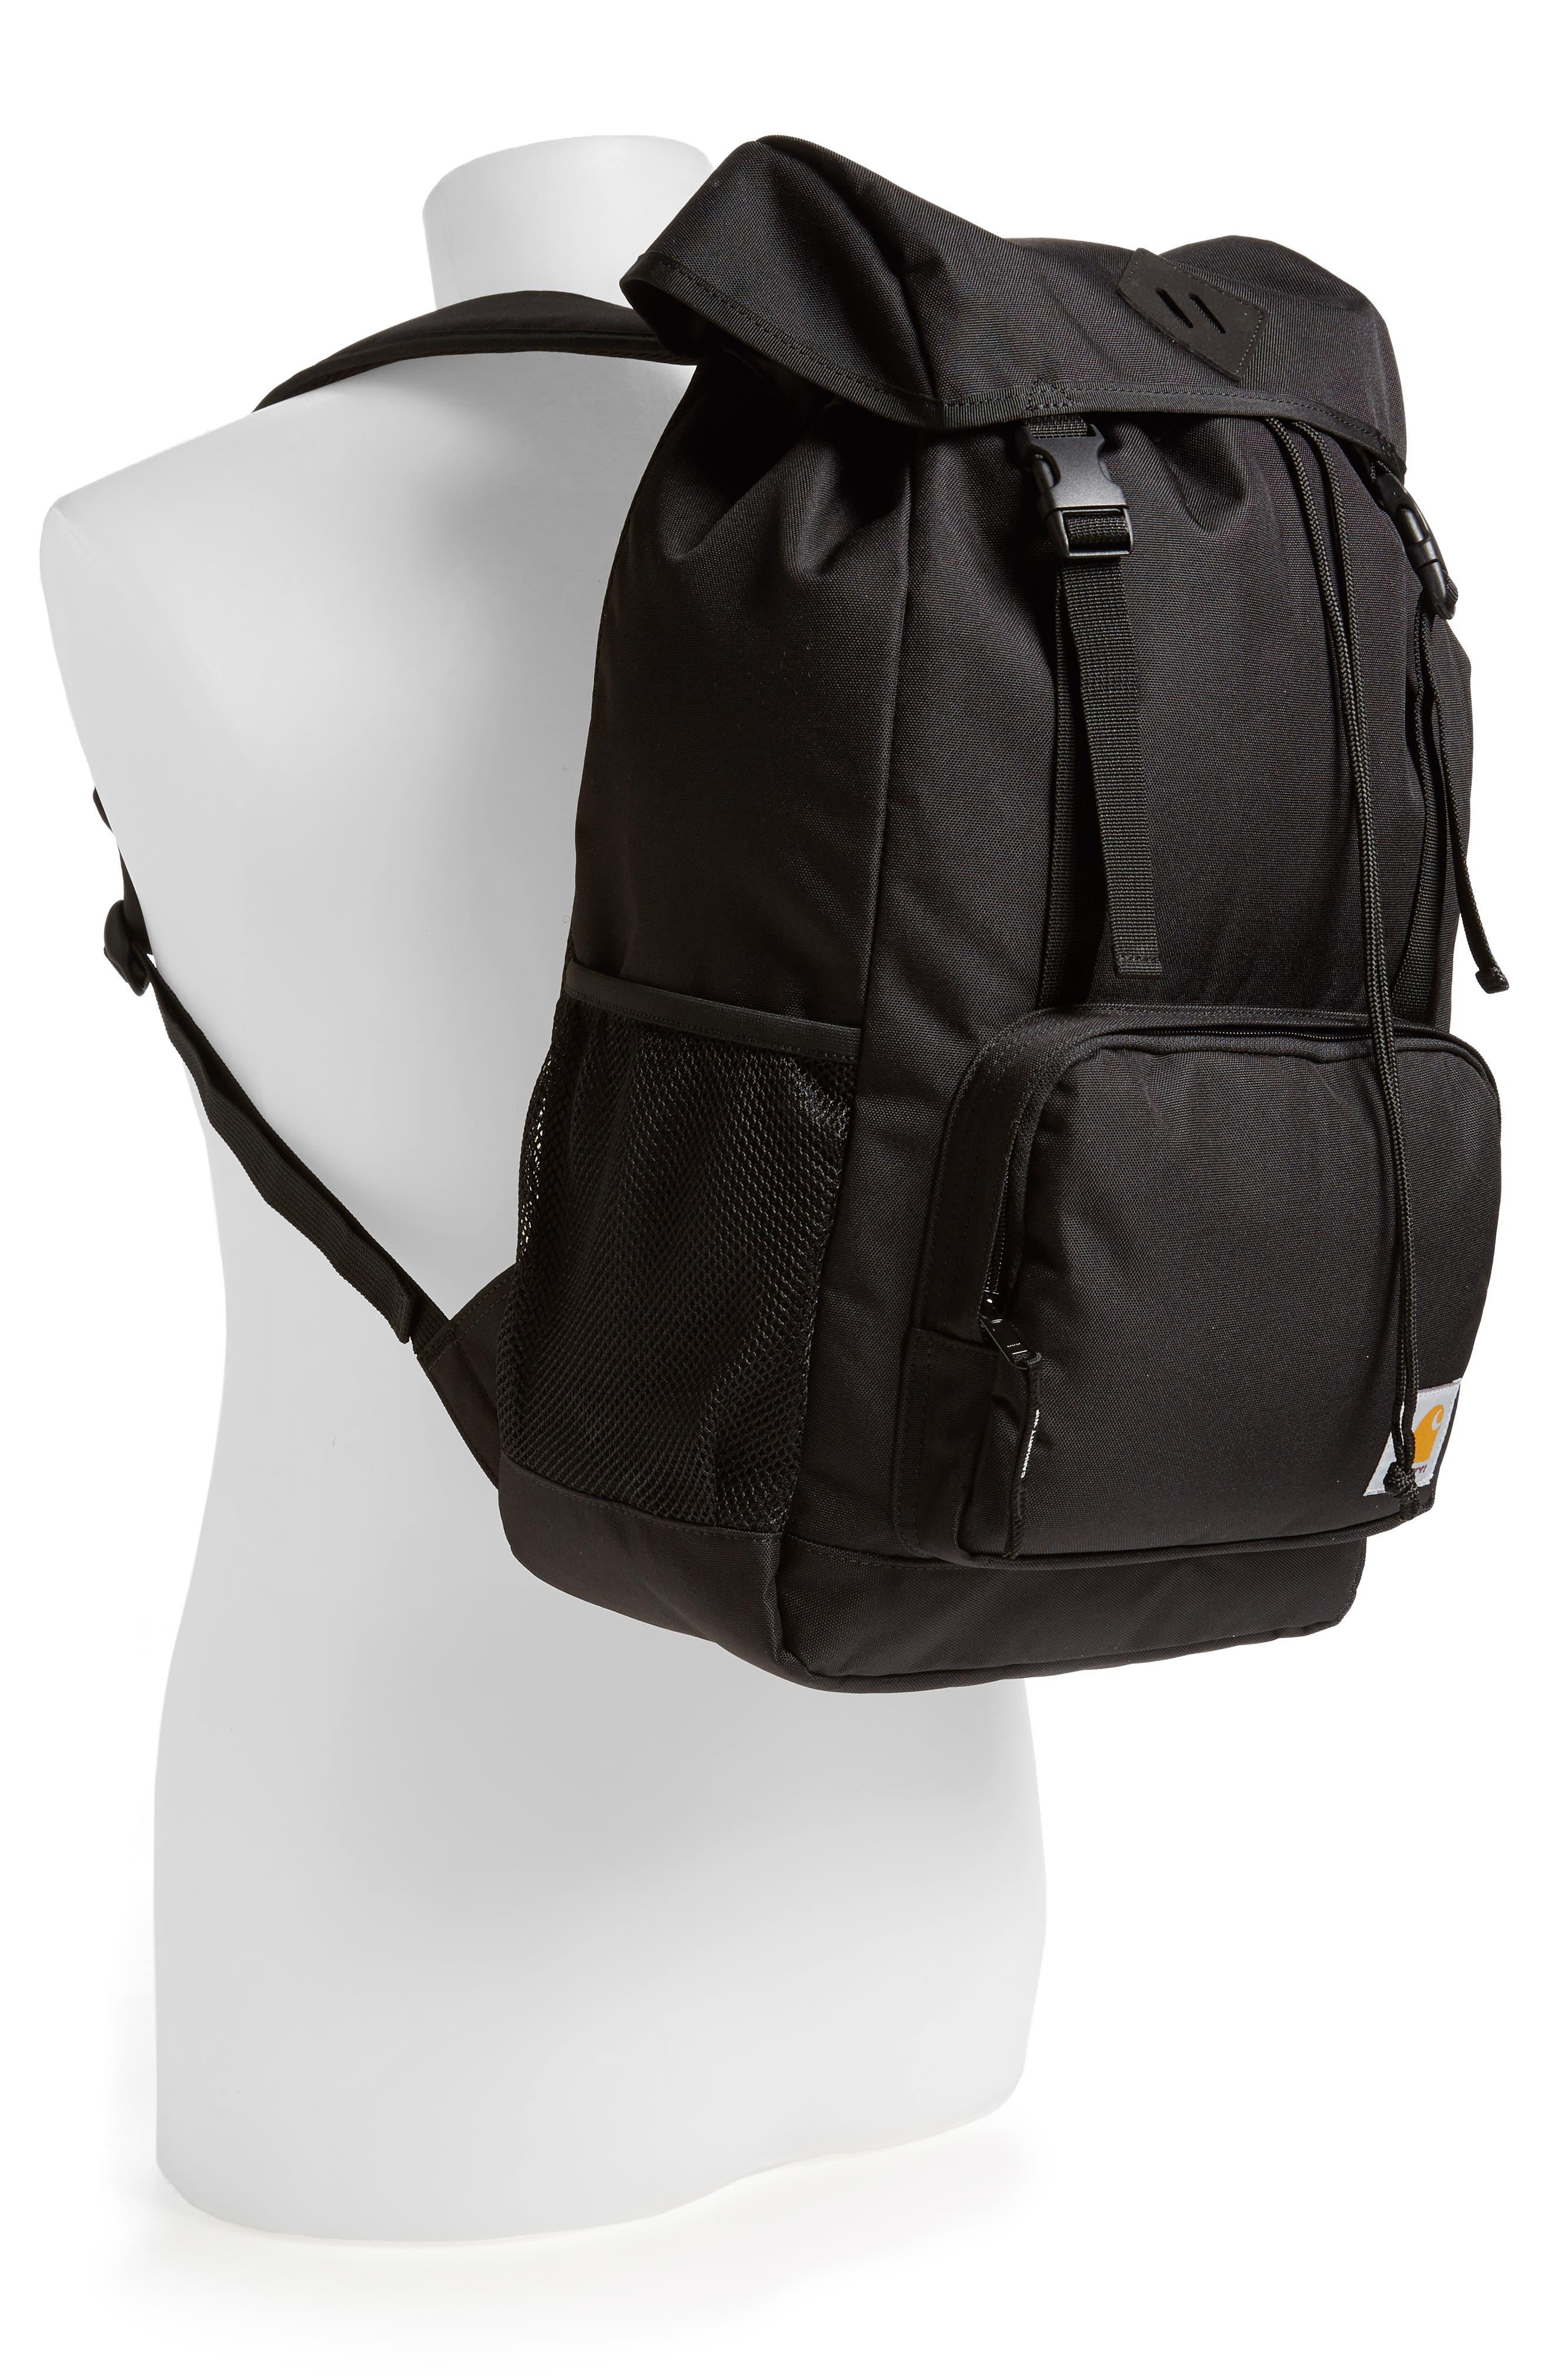 Gard Backpack,                             Alternate thumbnail 2, color,                             001